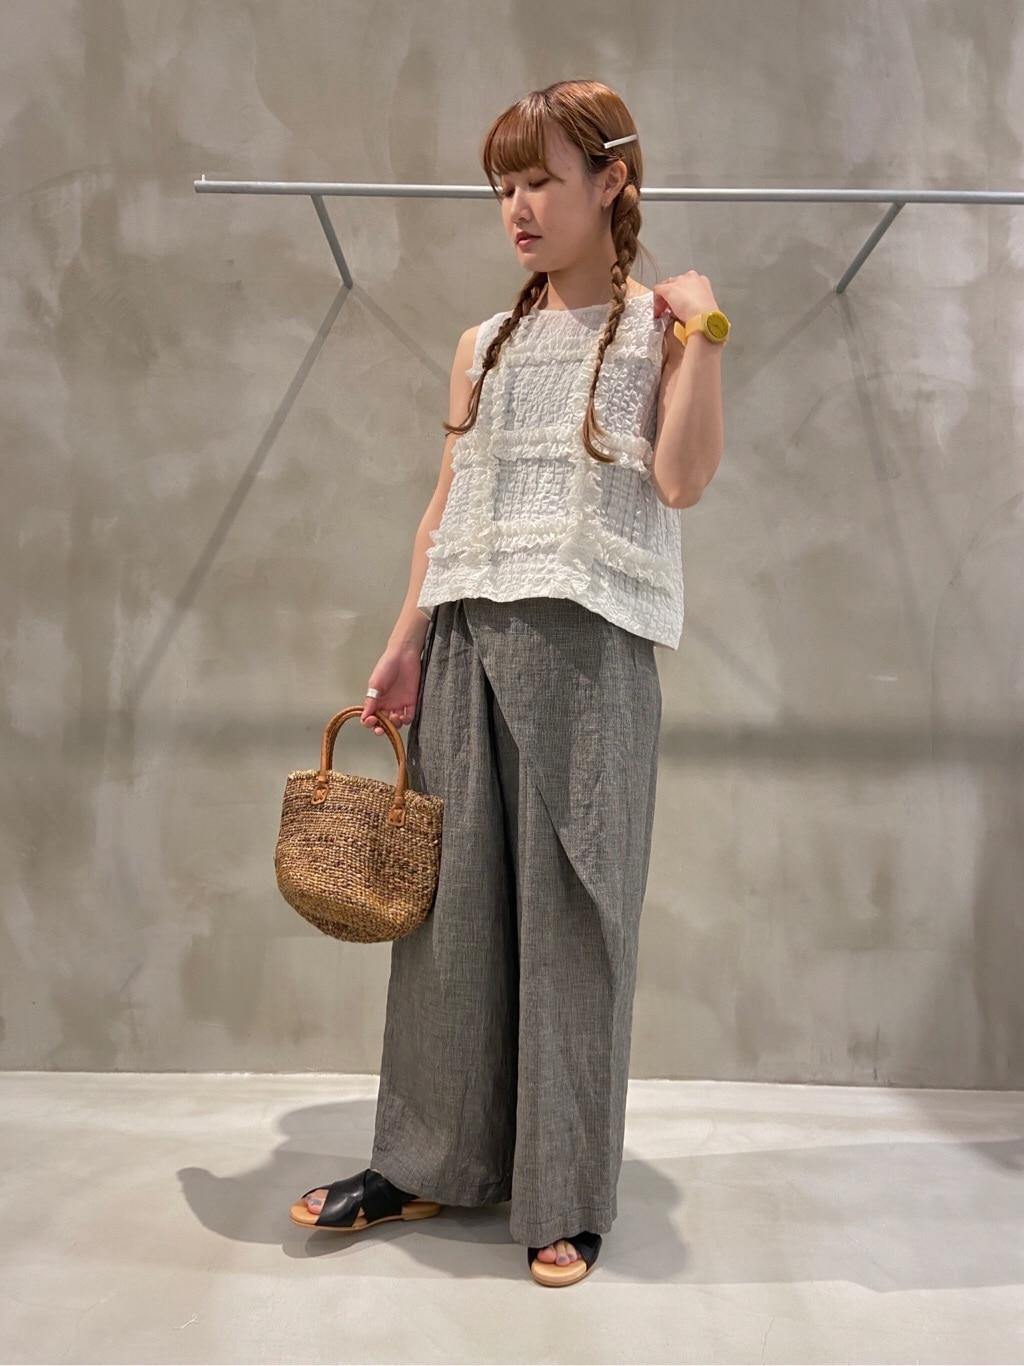 bulle de savon 渋谷スクランブルスクエア 身長:160cm 2020.06.22